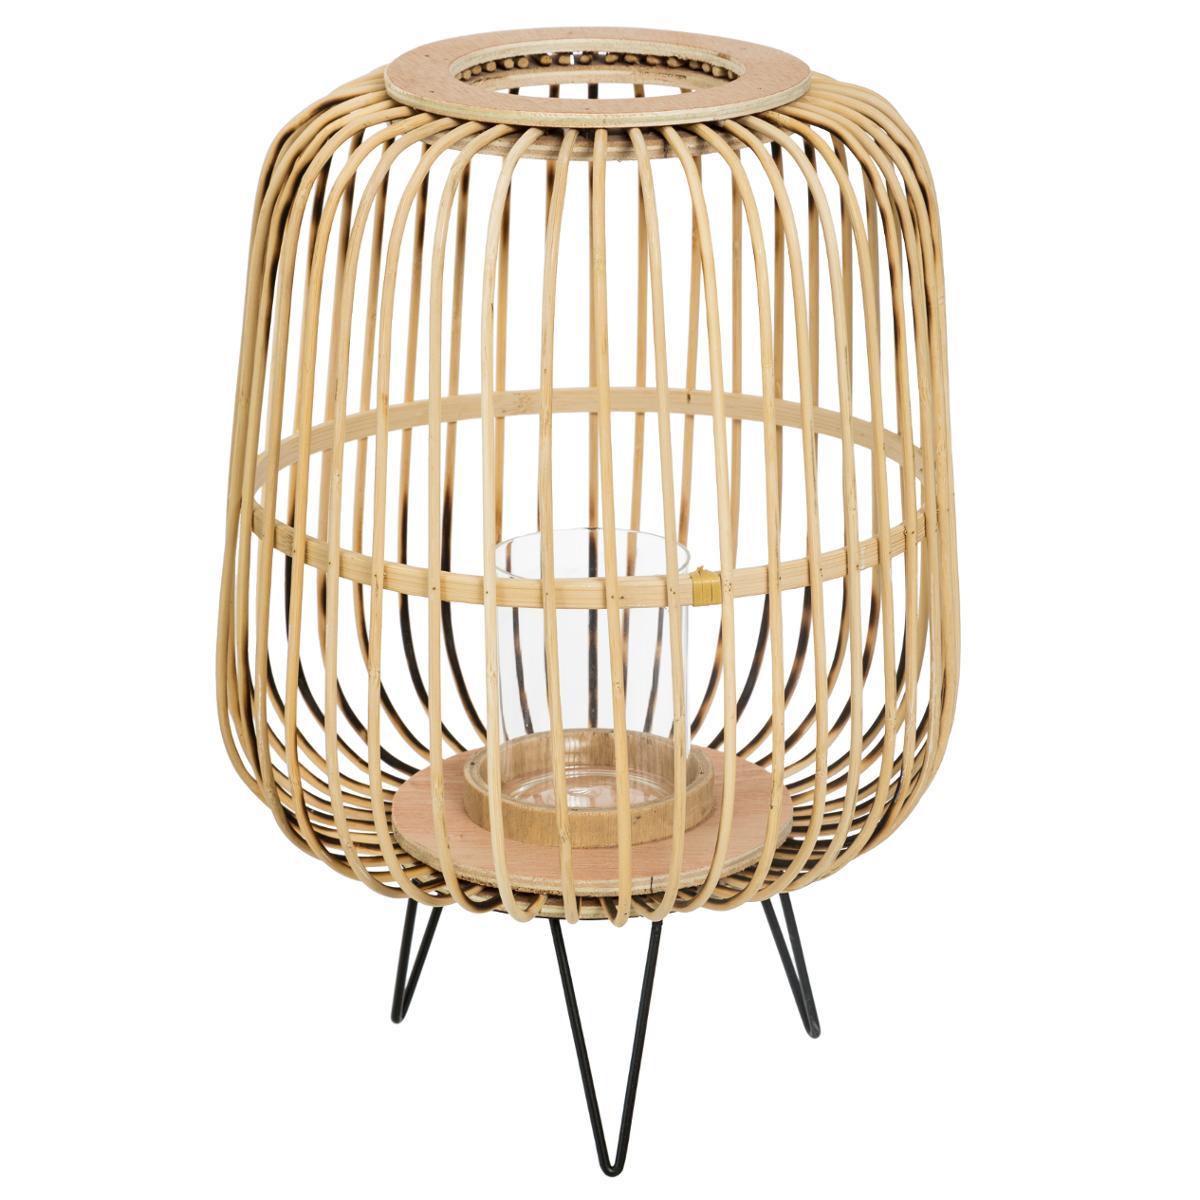 Lanterne Bambou Été - Atmosphera